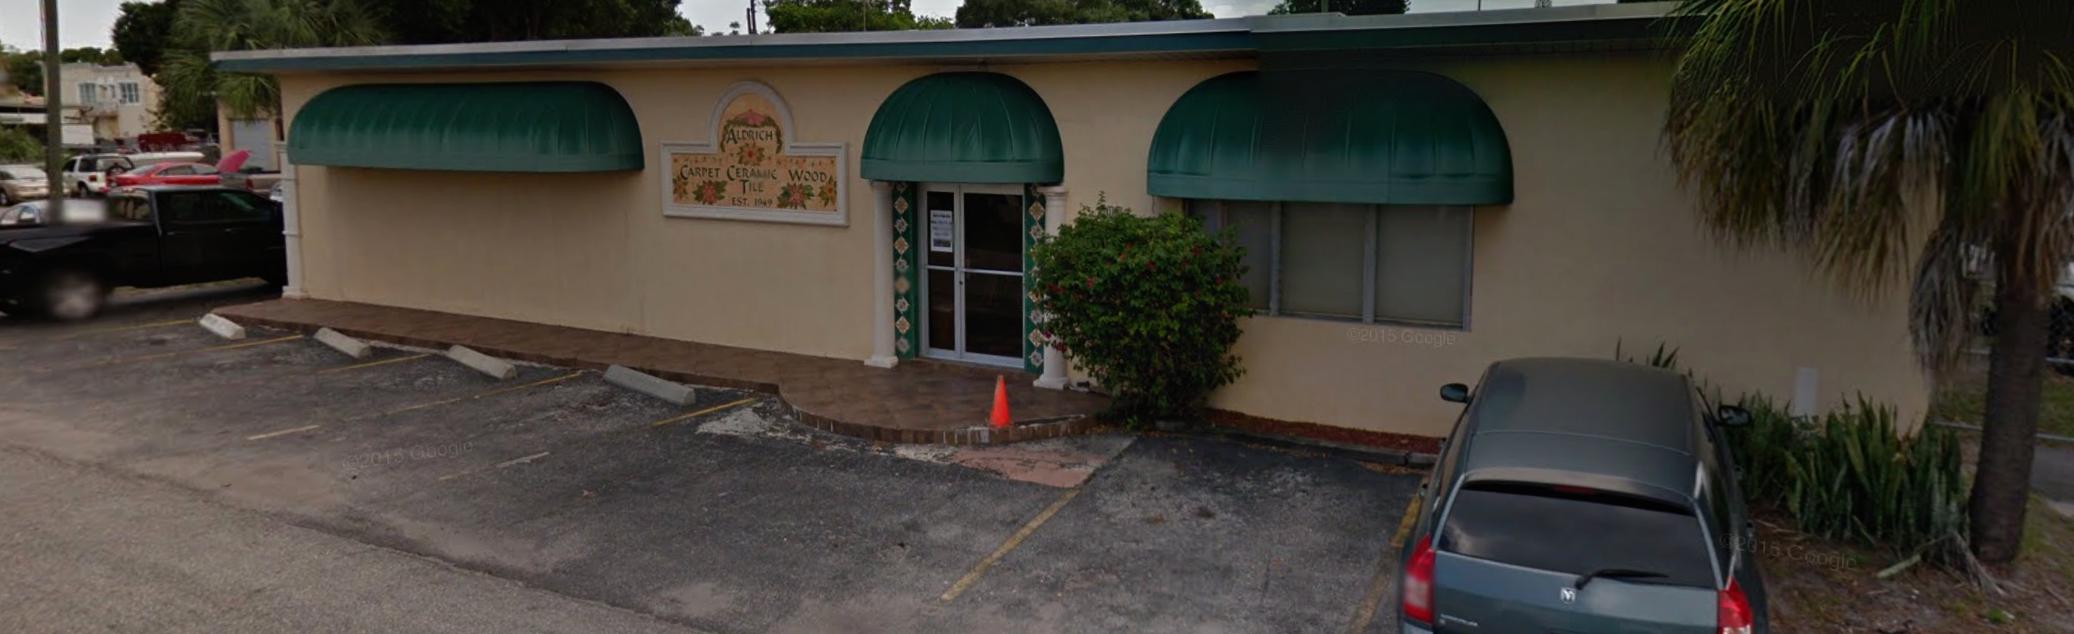 Ansbro Aldrich Flooring - 718 23rd Ave W, Bradenton, FL 34205